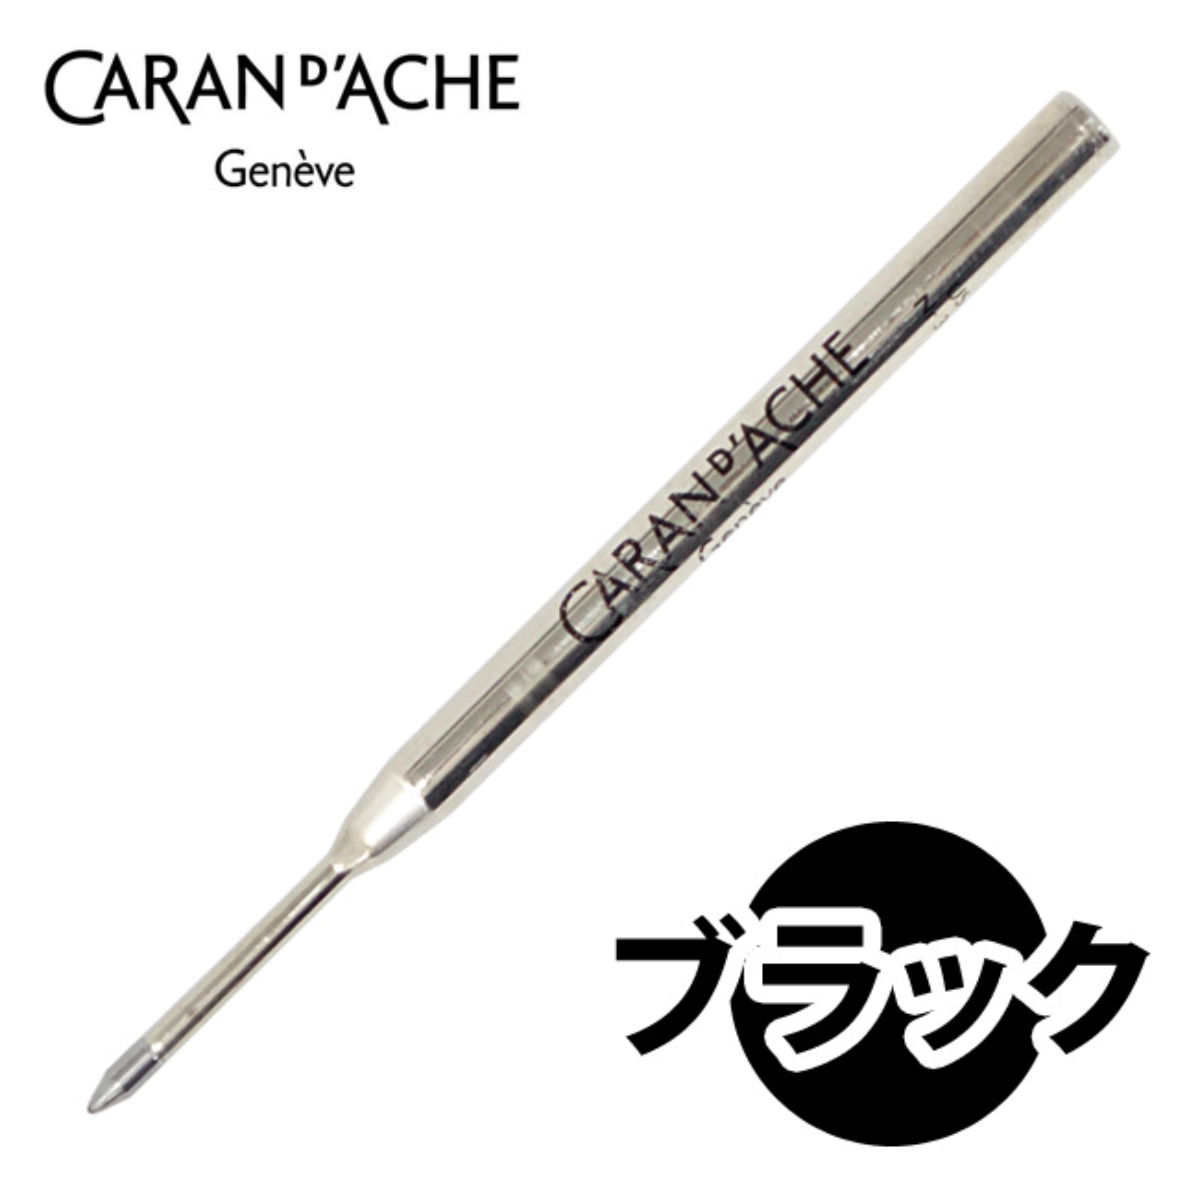 CARAN d'ACHE 8428 ボールペン カランダッシュ オープニング 低価格 大放出セール 替え芯 3サイズ ブラック